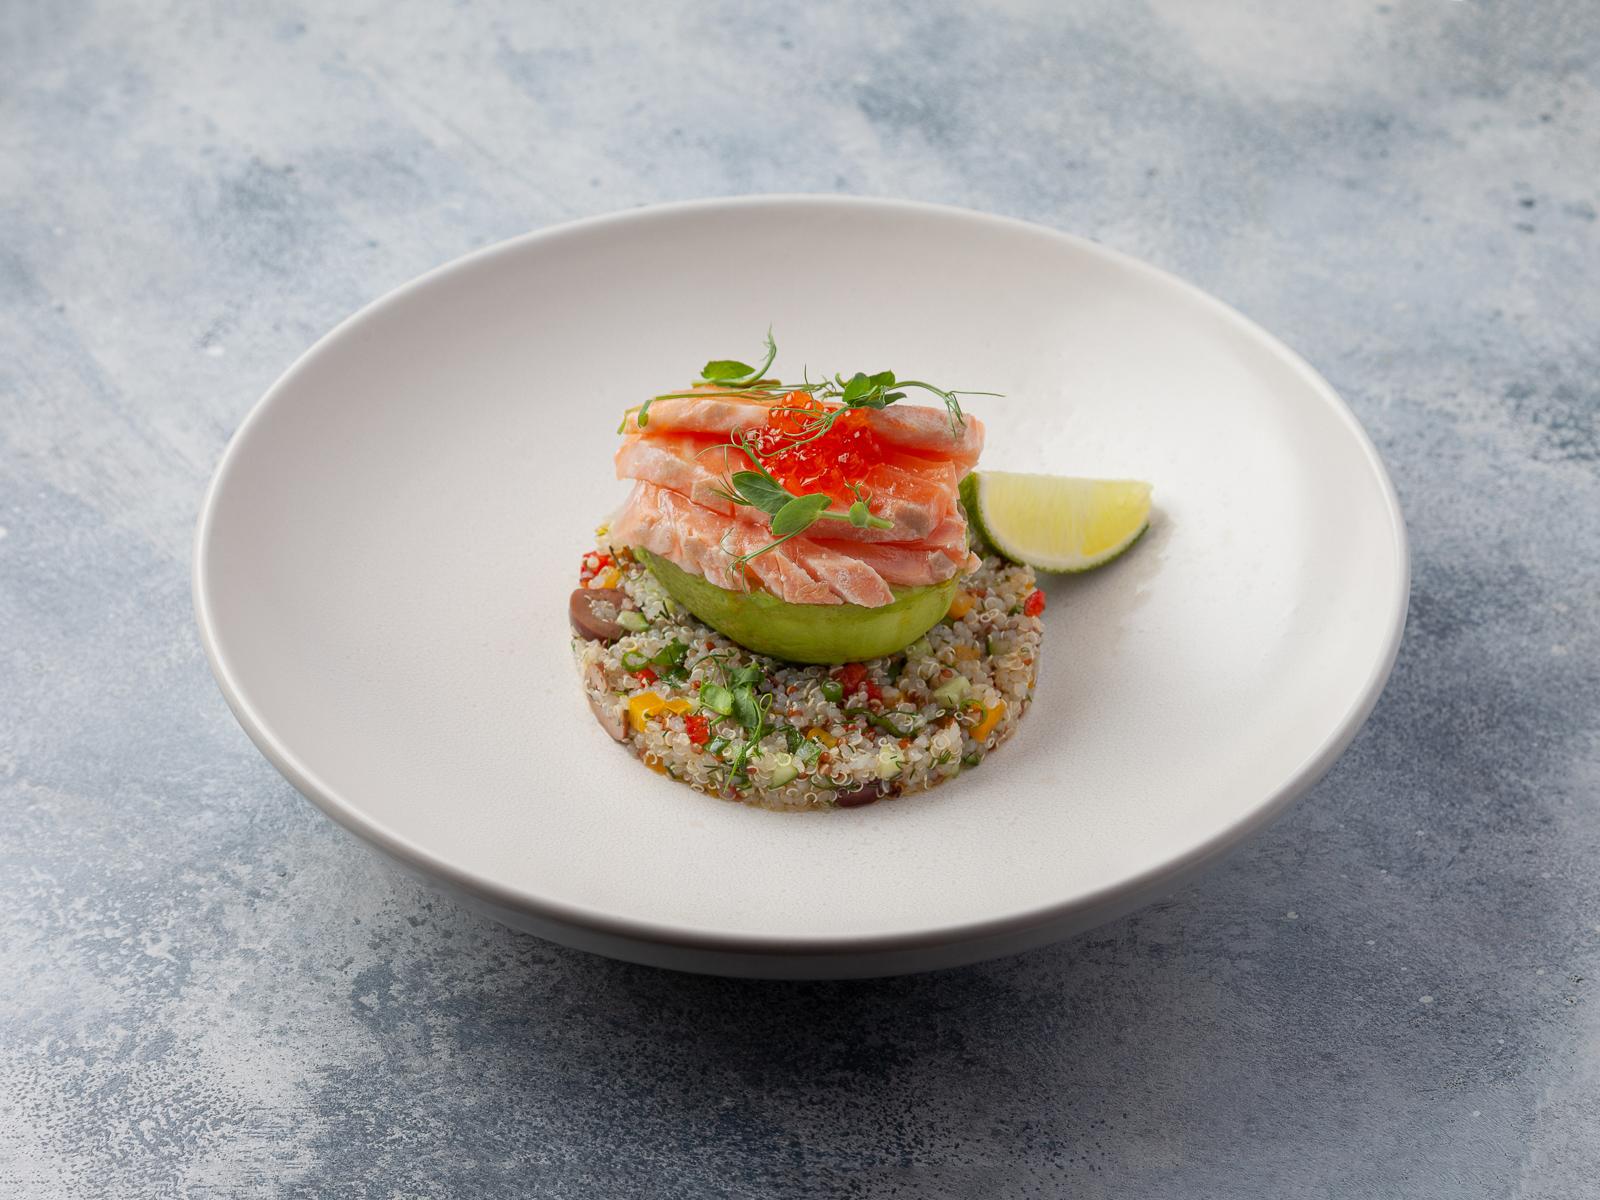 Салат с лососем, свежими овощами и киноа «по-гречески»